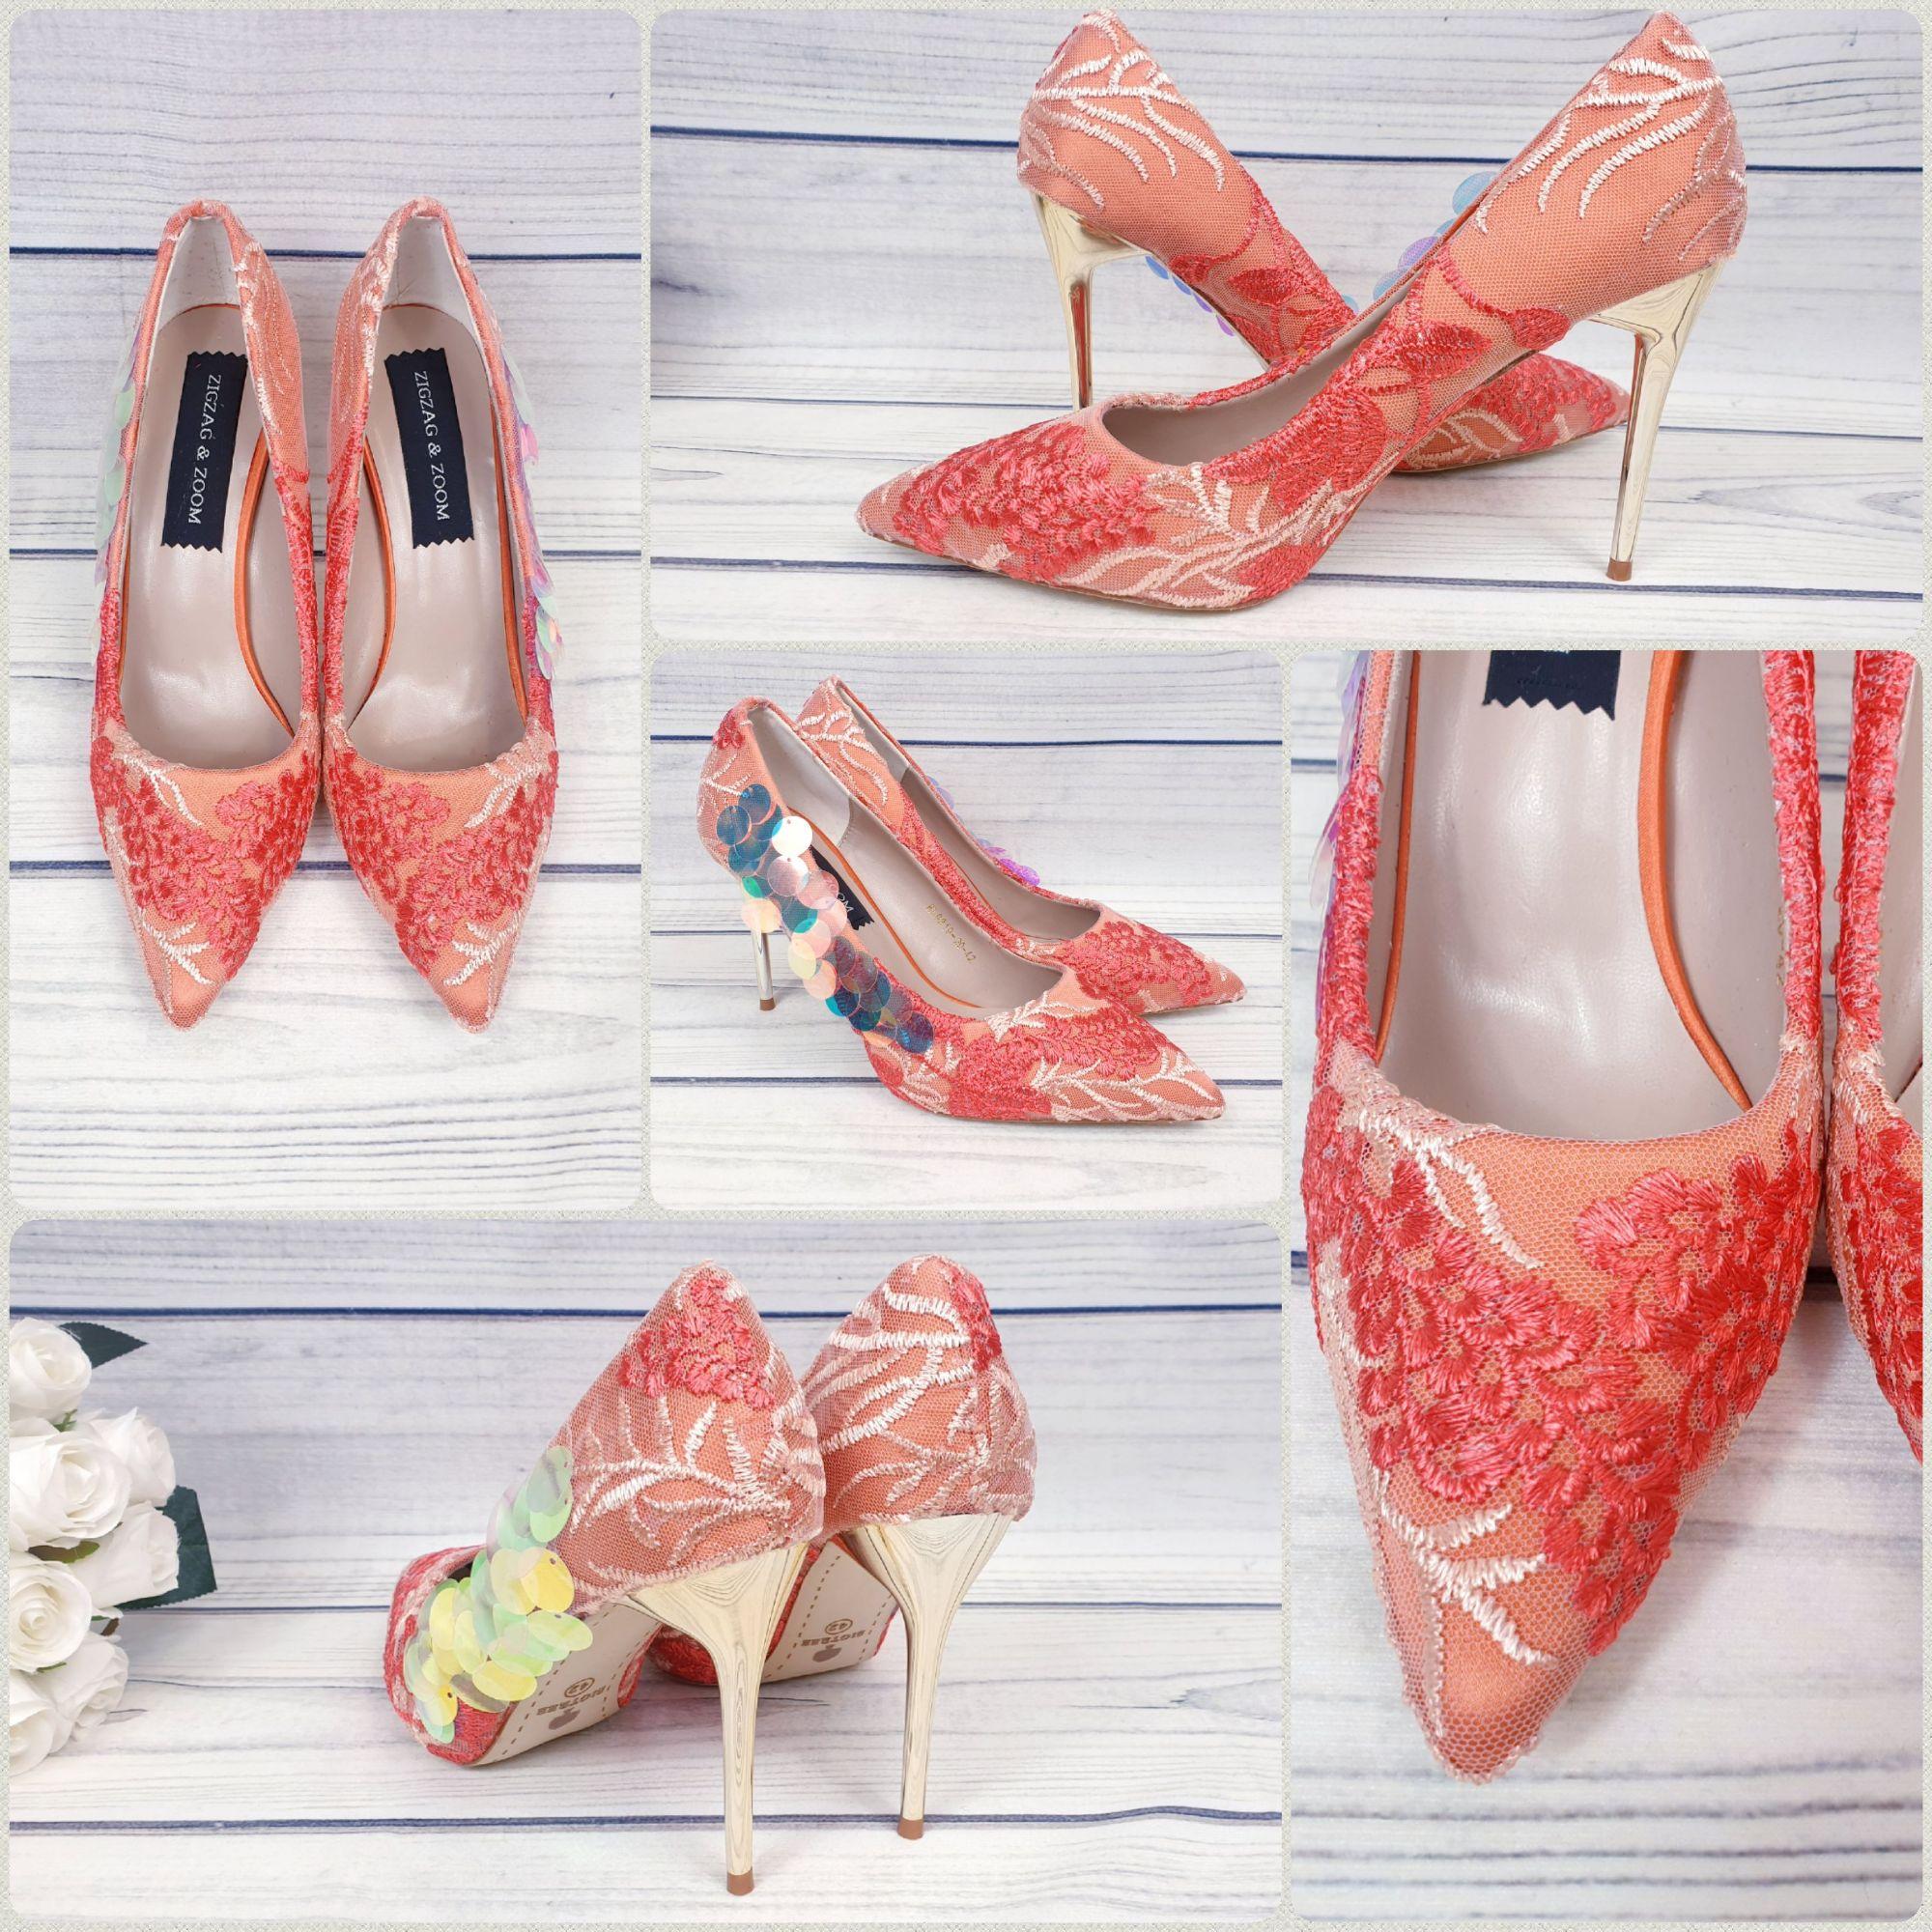 Beautiful custom designed shoes